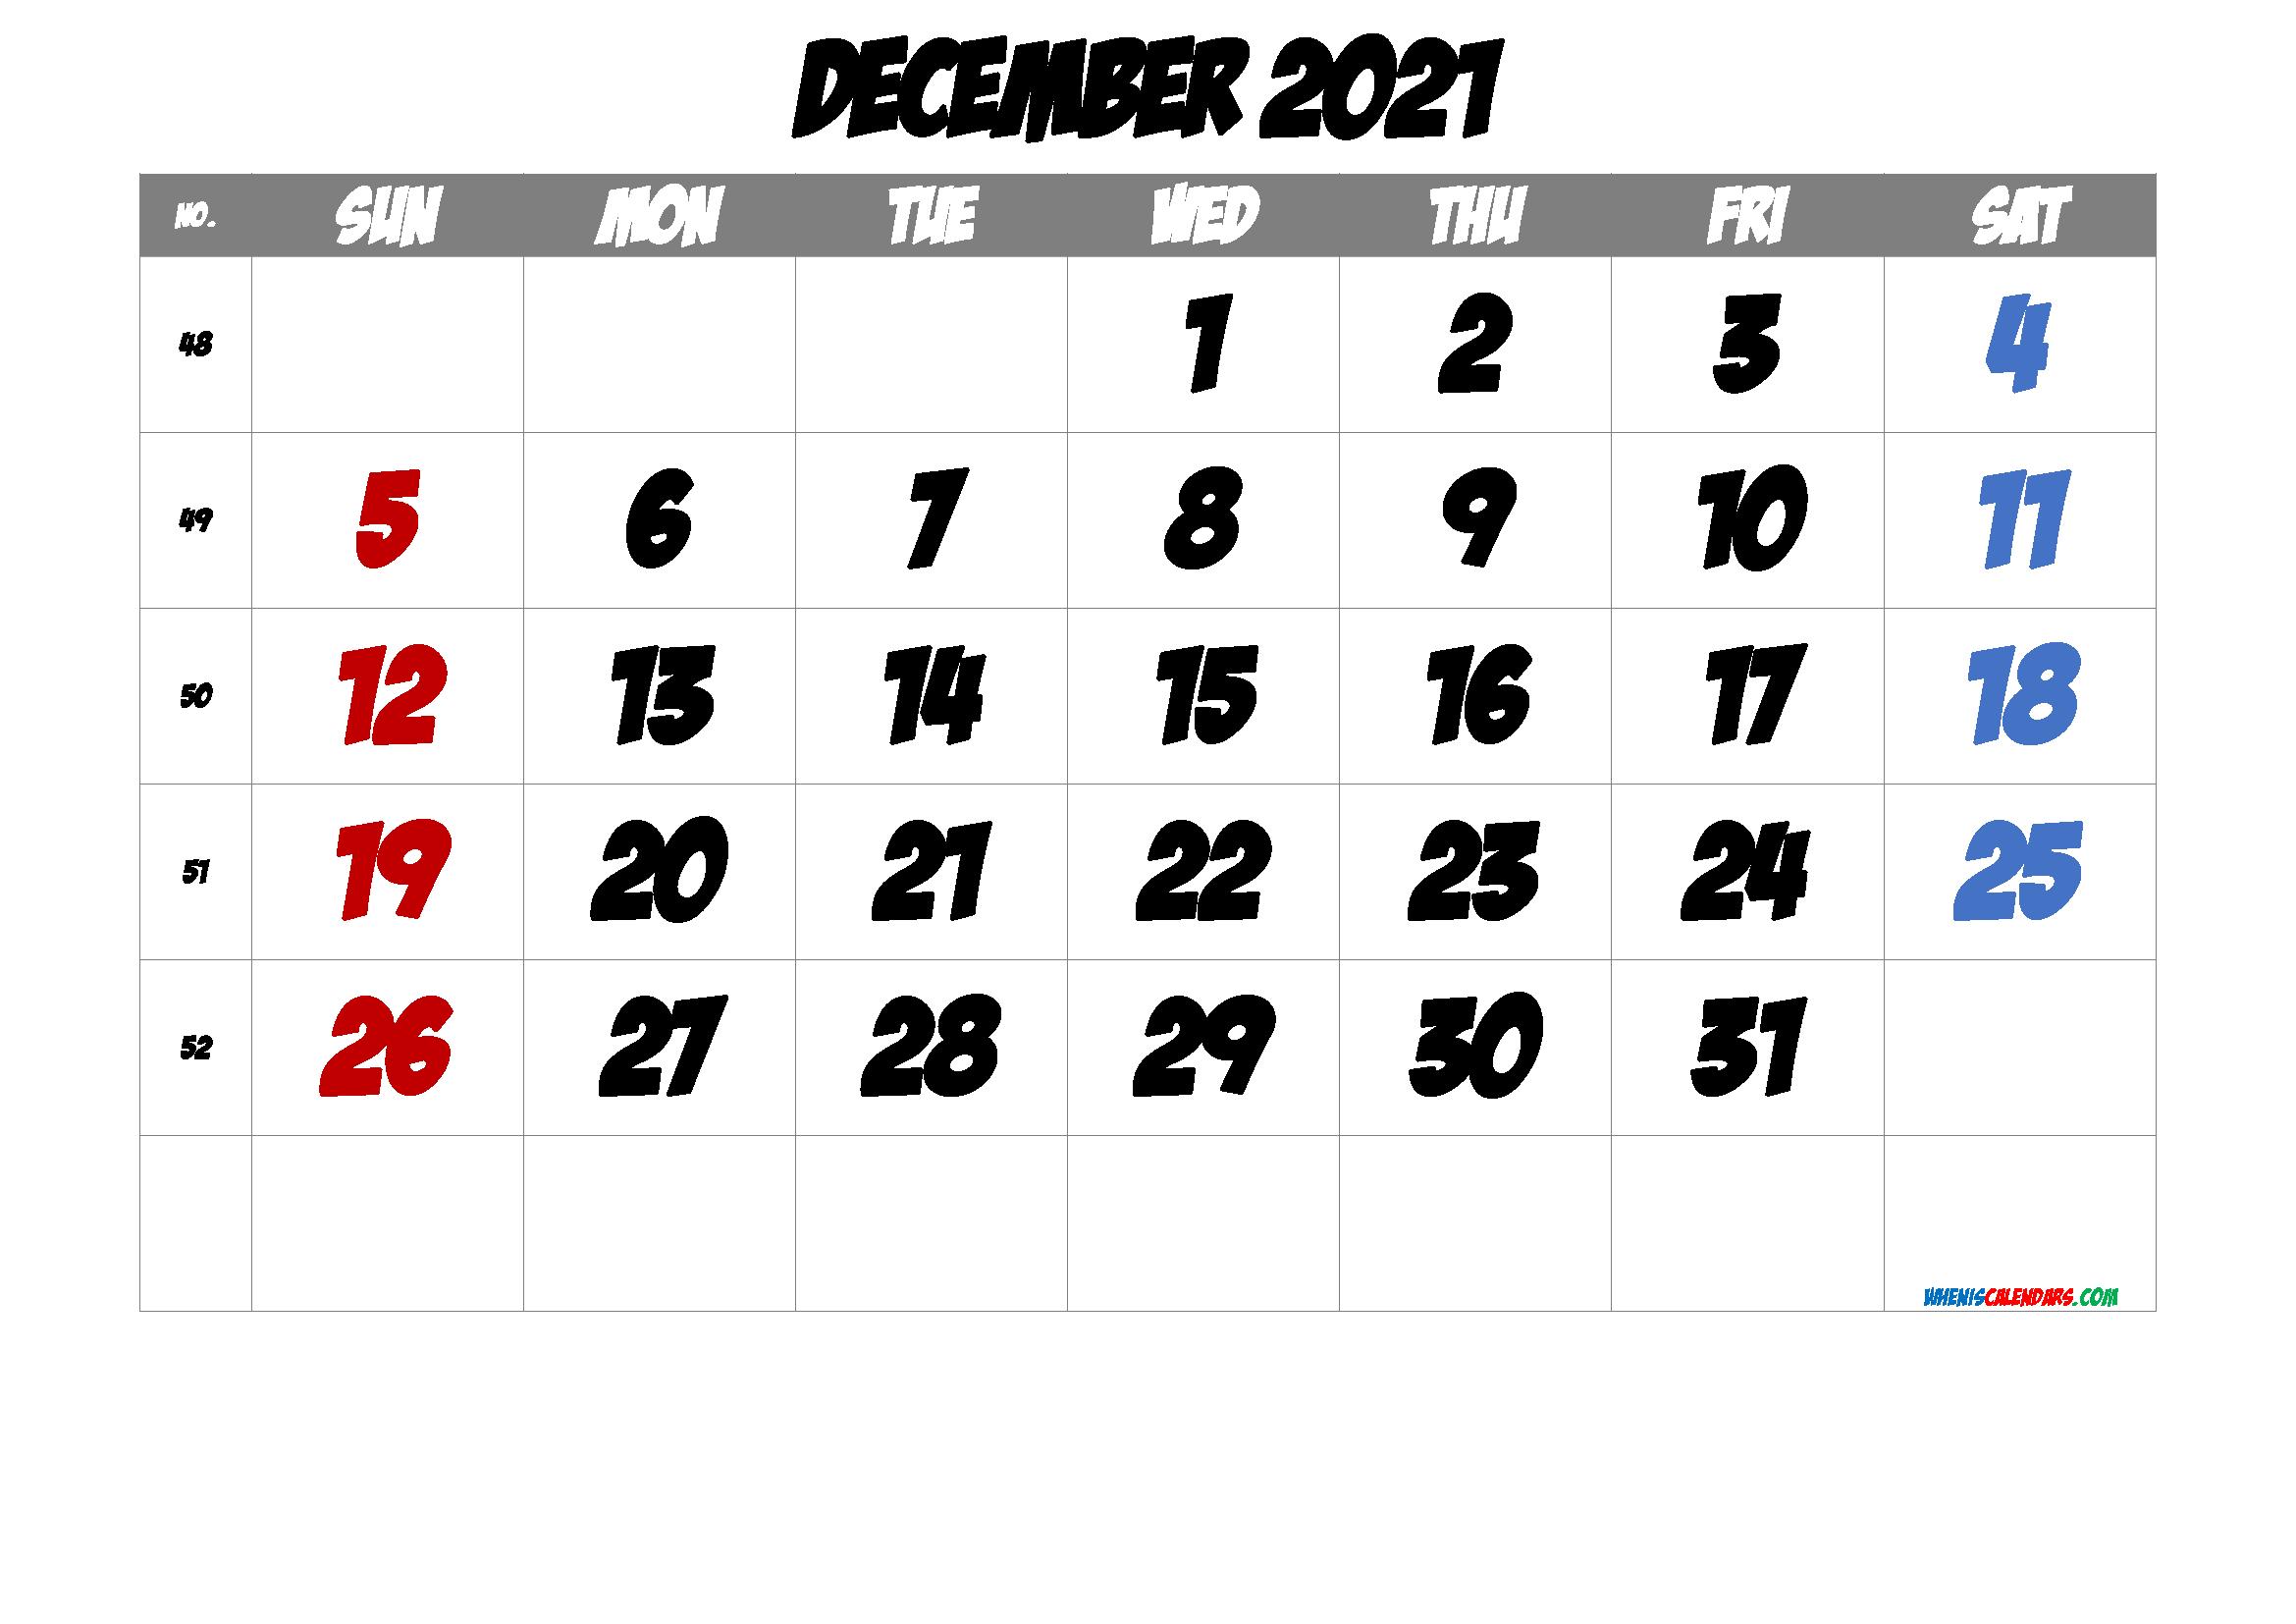 2021 December Free Printable Calendar Free Premium In 2020 2021 Calendar Printable Calendar Printable Calendar Template